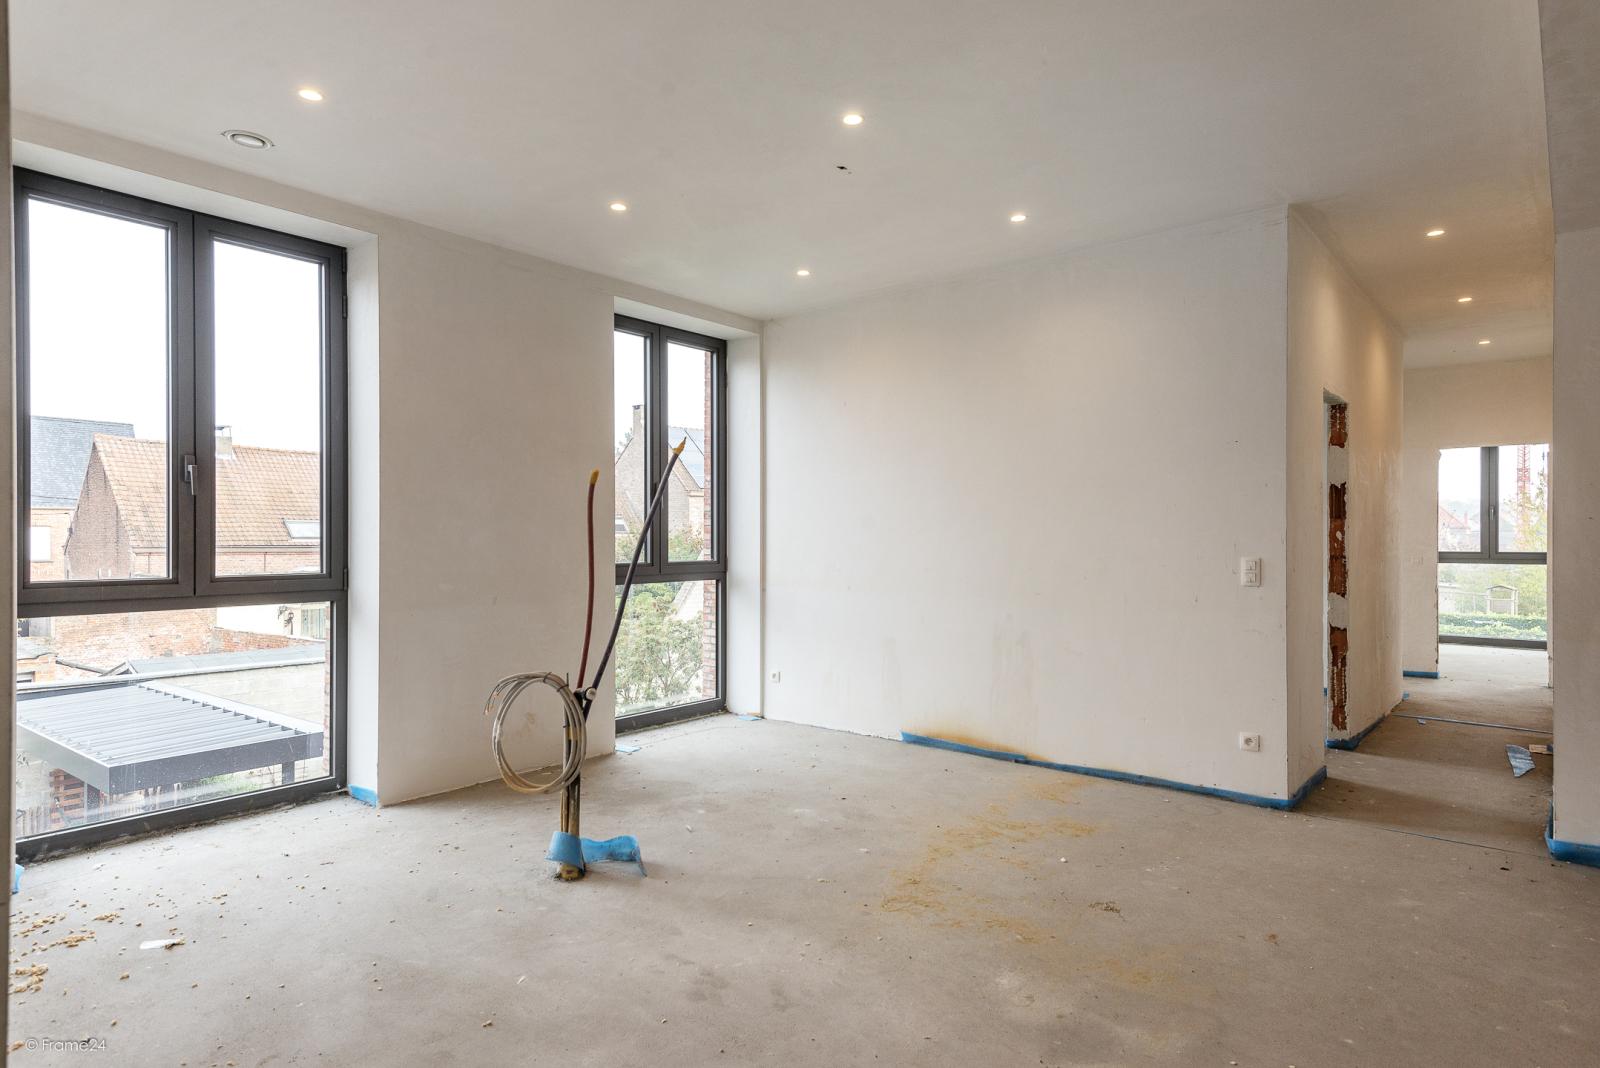 Riant vernieuwd appartement (147 m²) op centrale ligging te Walem! afbeelding 2